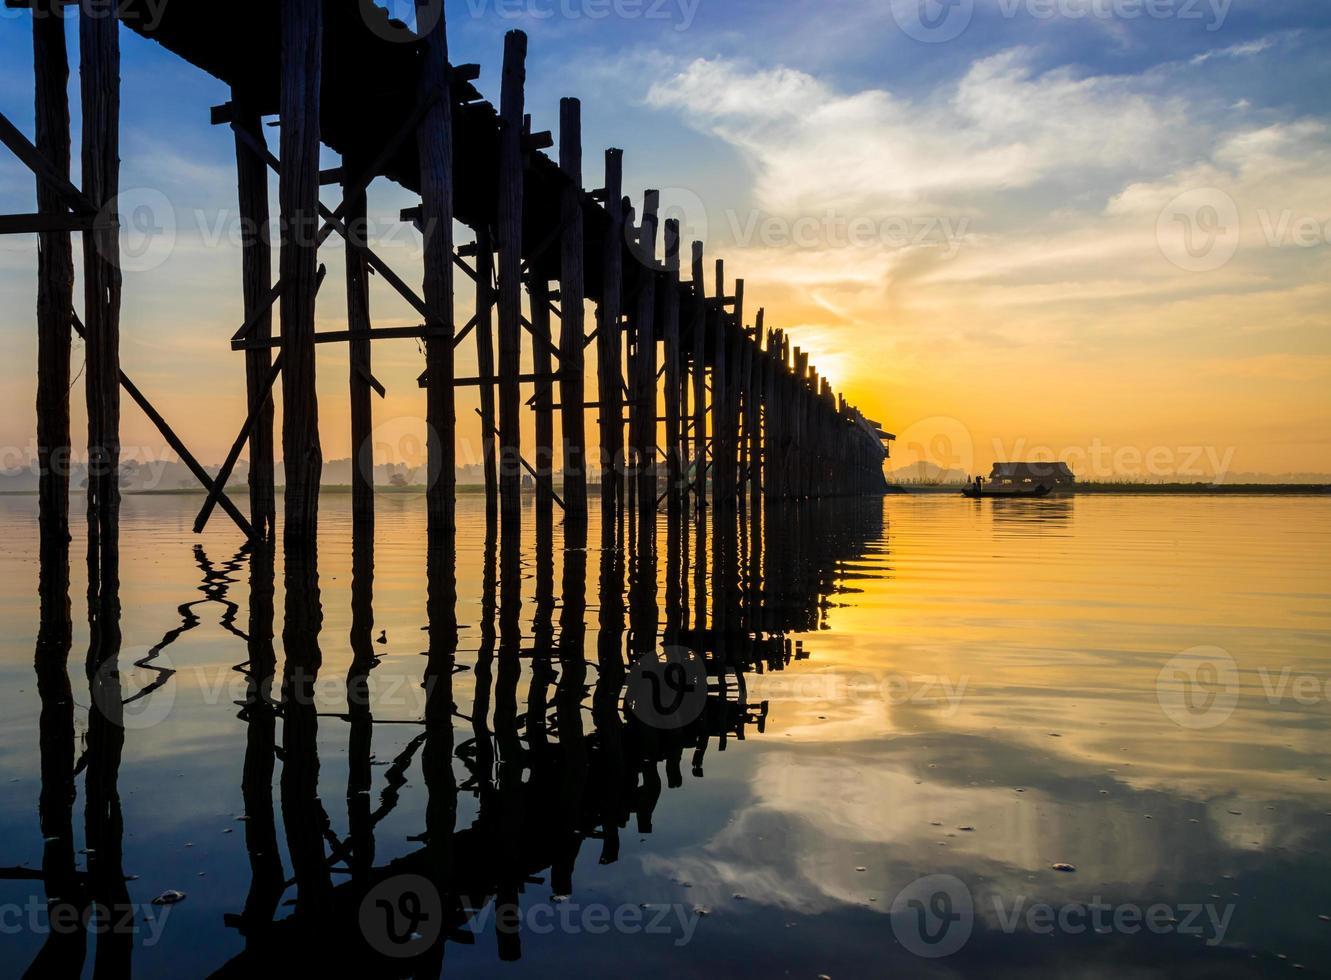 Ubein Brücke bei Sonnenaufgang, Mandalay, Myanmar foto